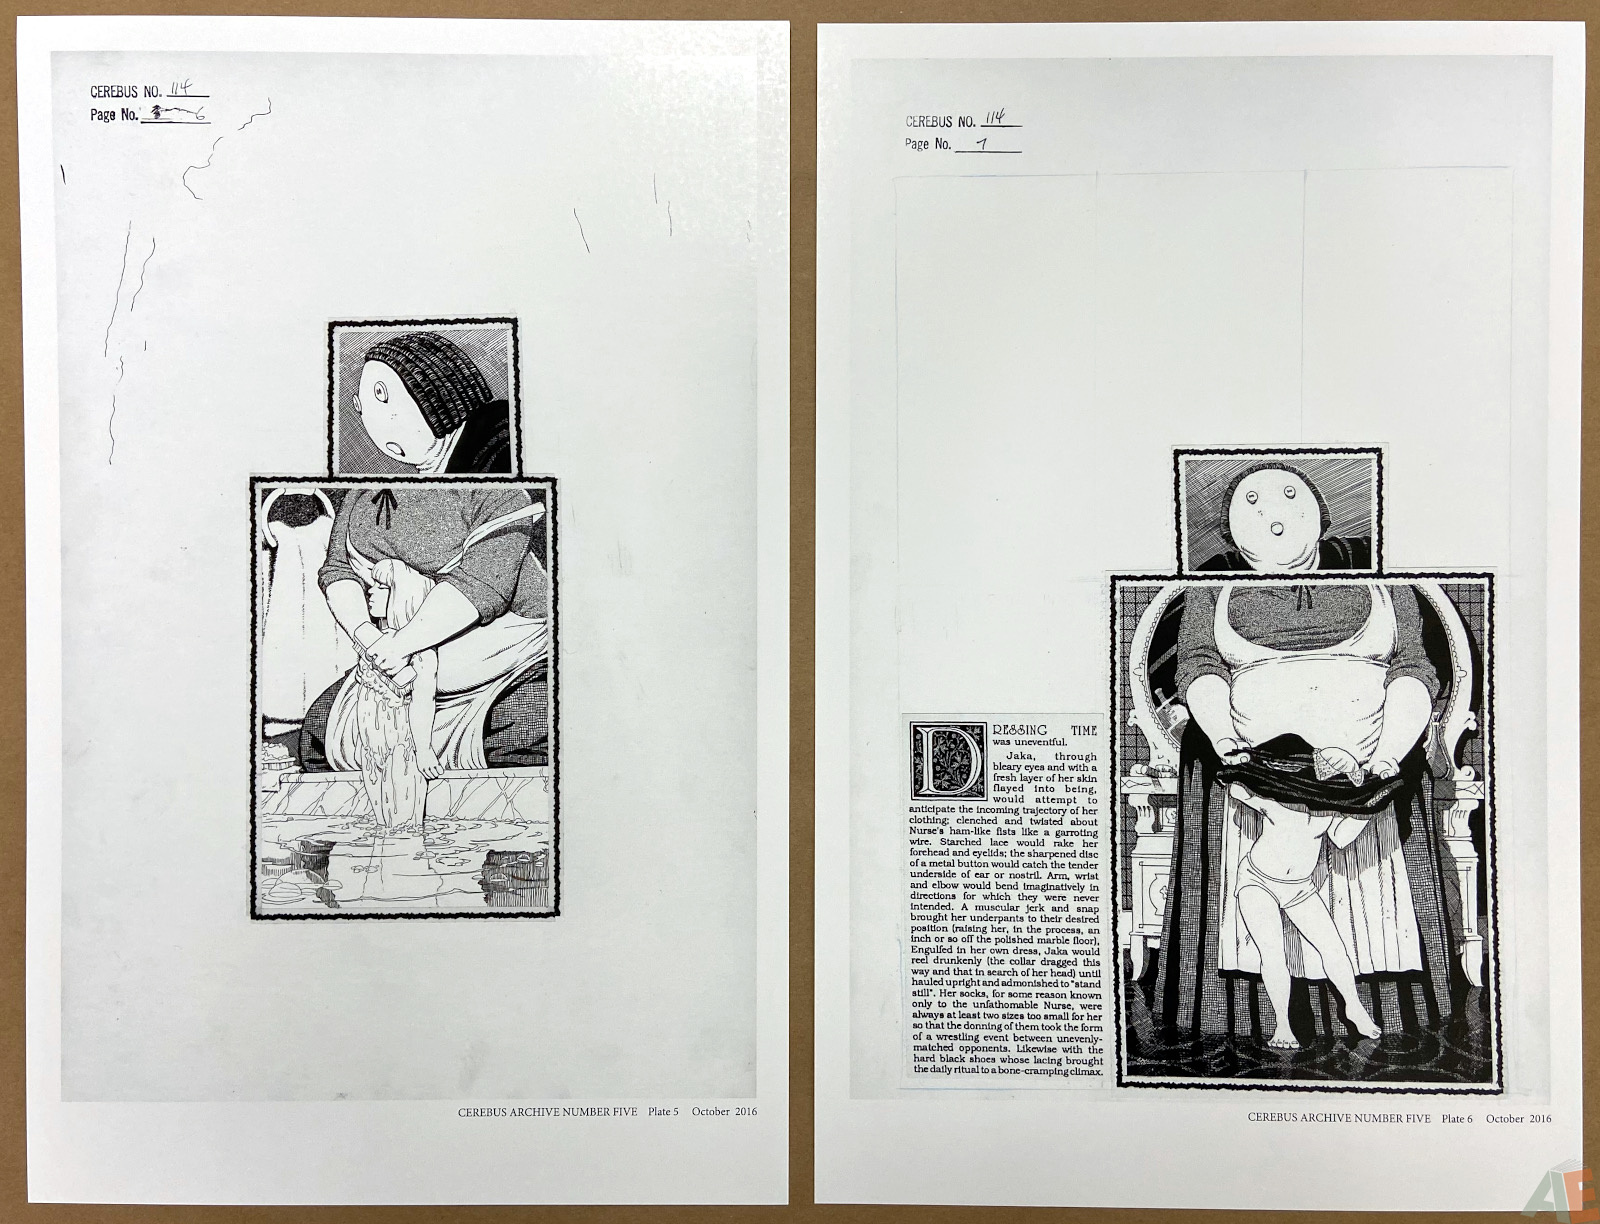 Cerebus Archive Number Five